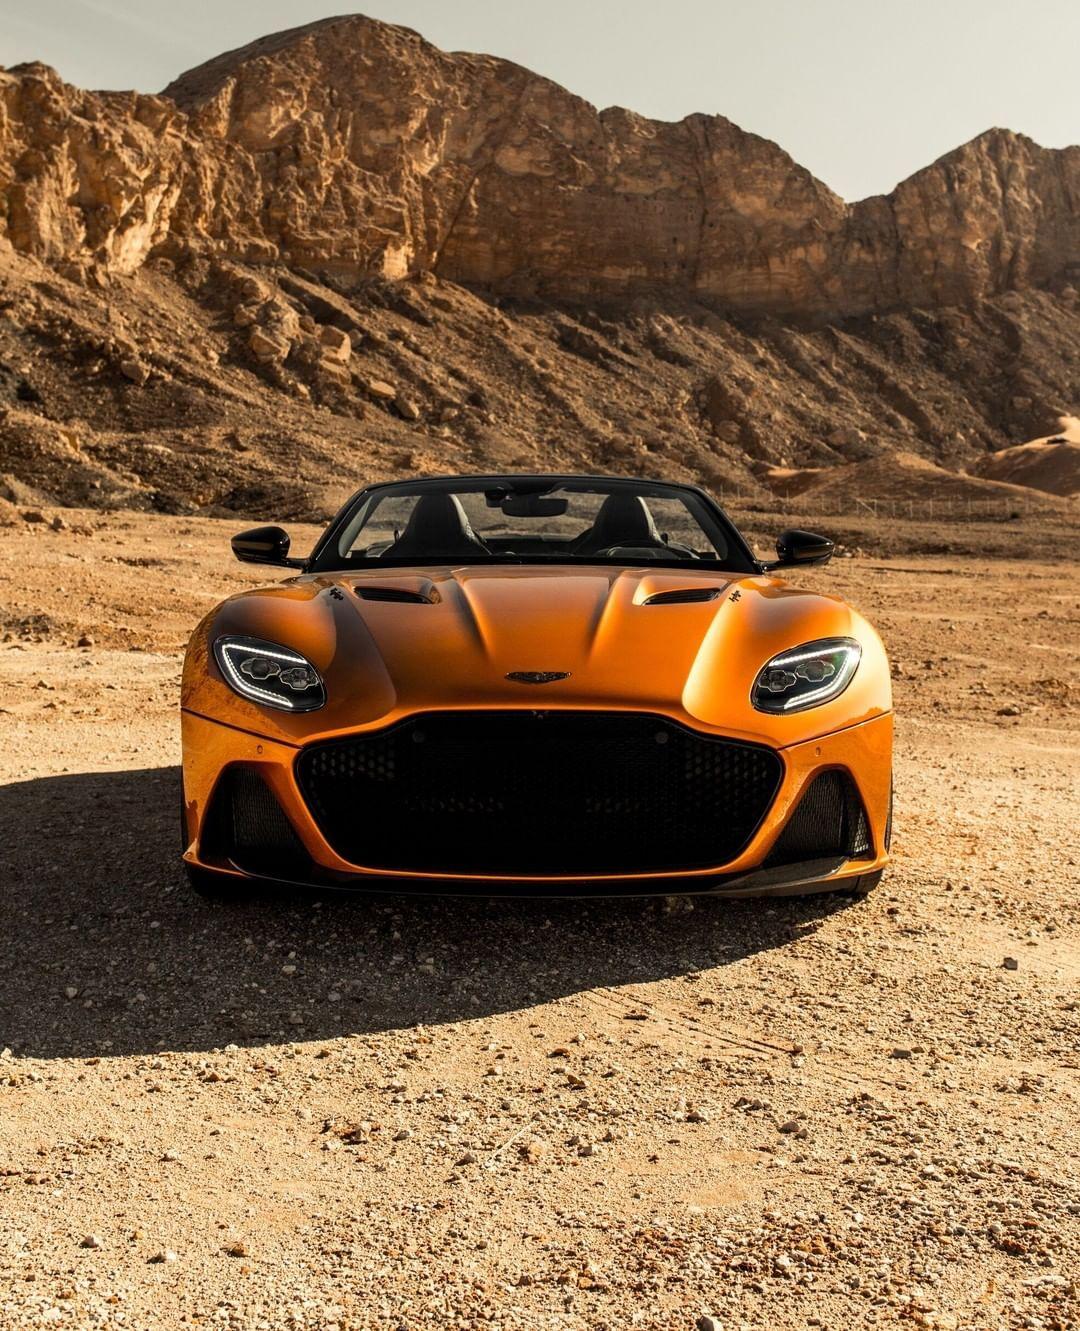 153 9k Likes 258 Comments Aston Martin Astonmartinlagonda On Instagram Menacingly Attractive Aston Martin Cars Aston Martin Aston Martin Dbs Volante